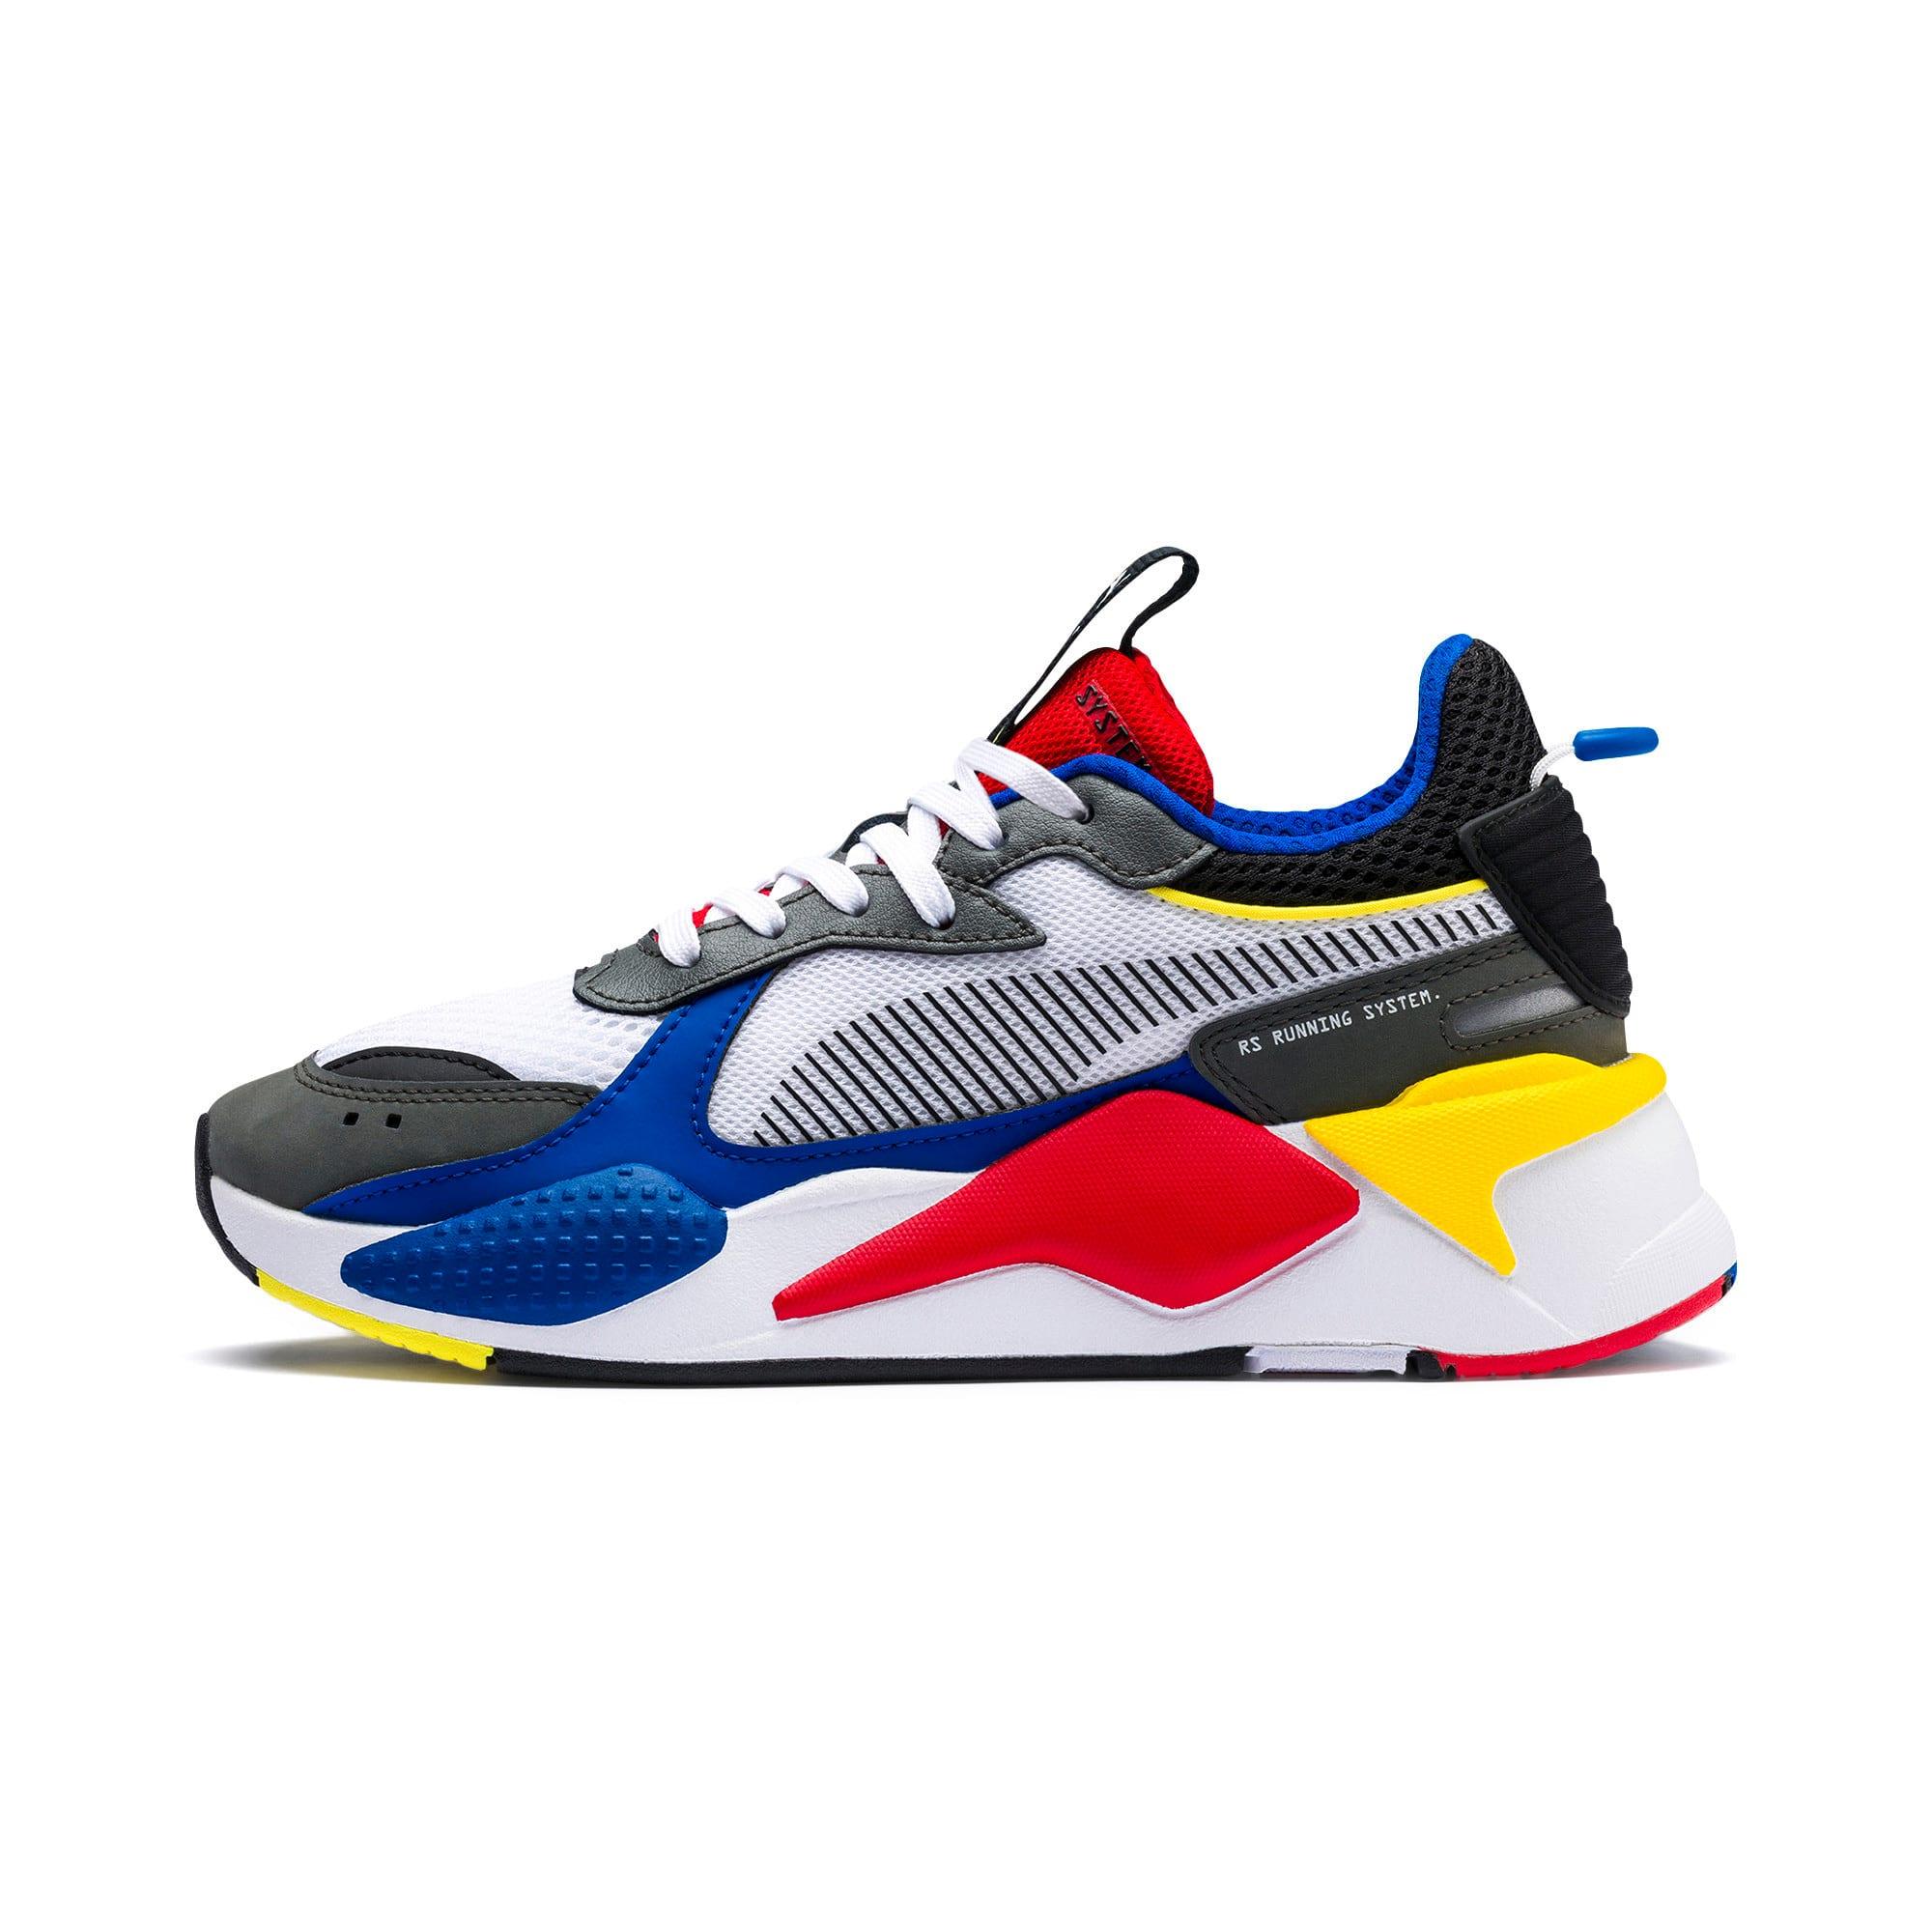 Thumbnail 1 of RS-X Toys Sneakers JR, Puma White-Puma Royal, medium